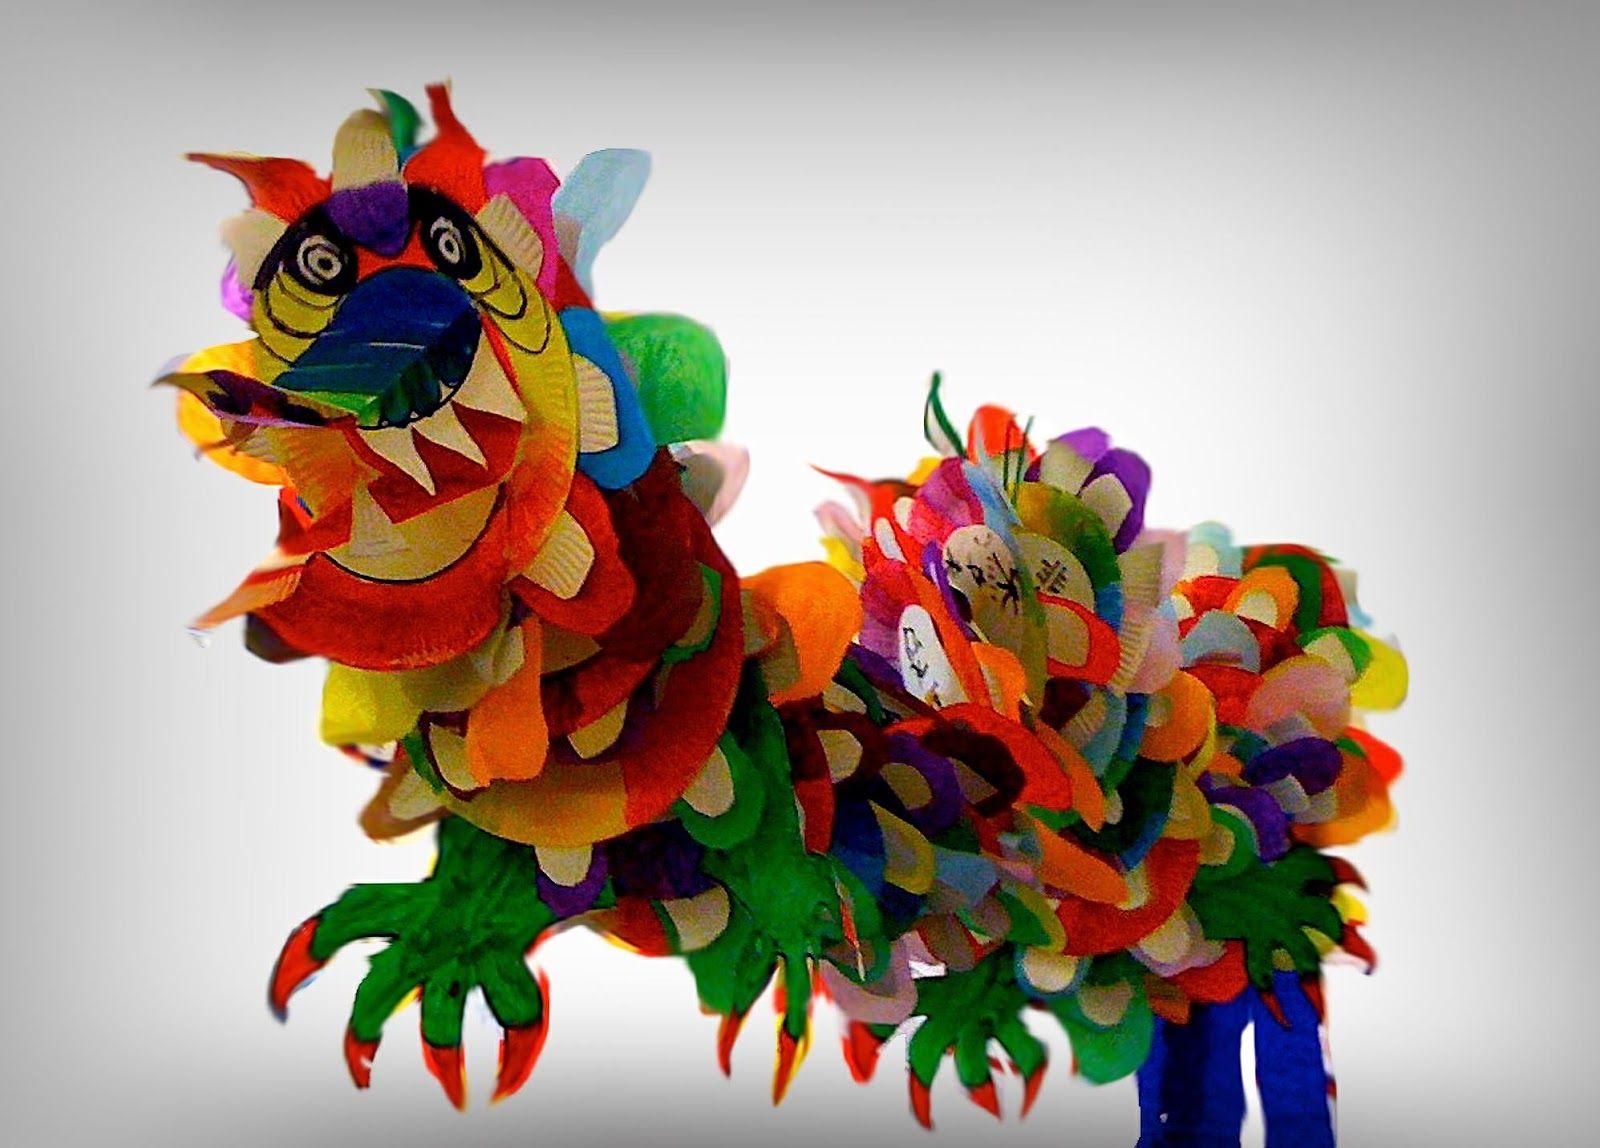 Arteascuola Collaborative Dragon Create A Color Wheel To